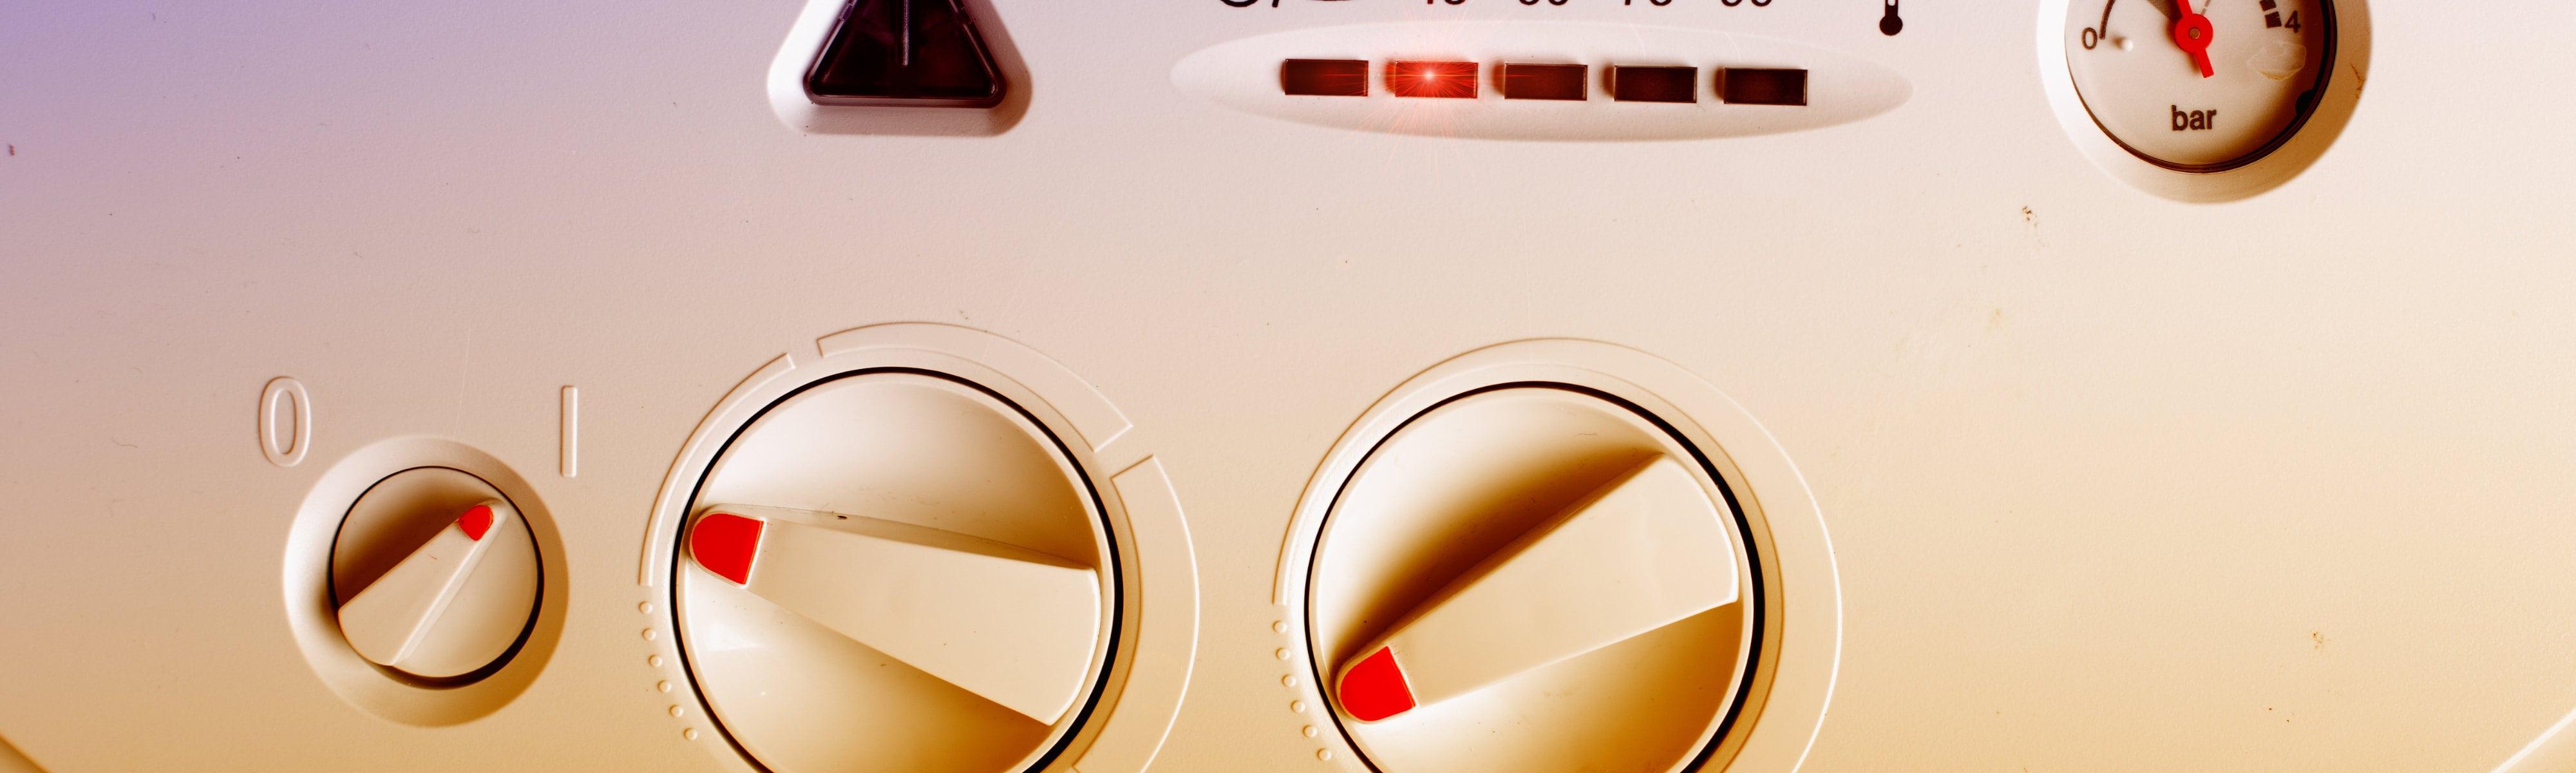 Gas boiler controls close up.